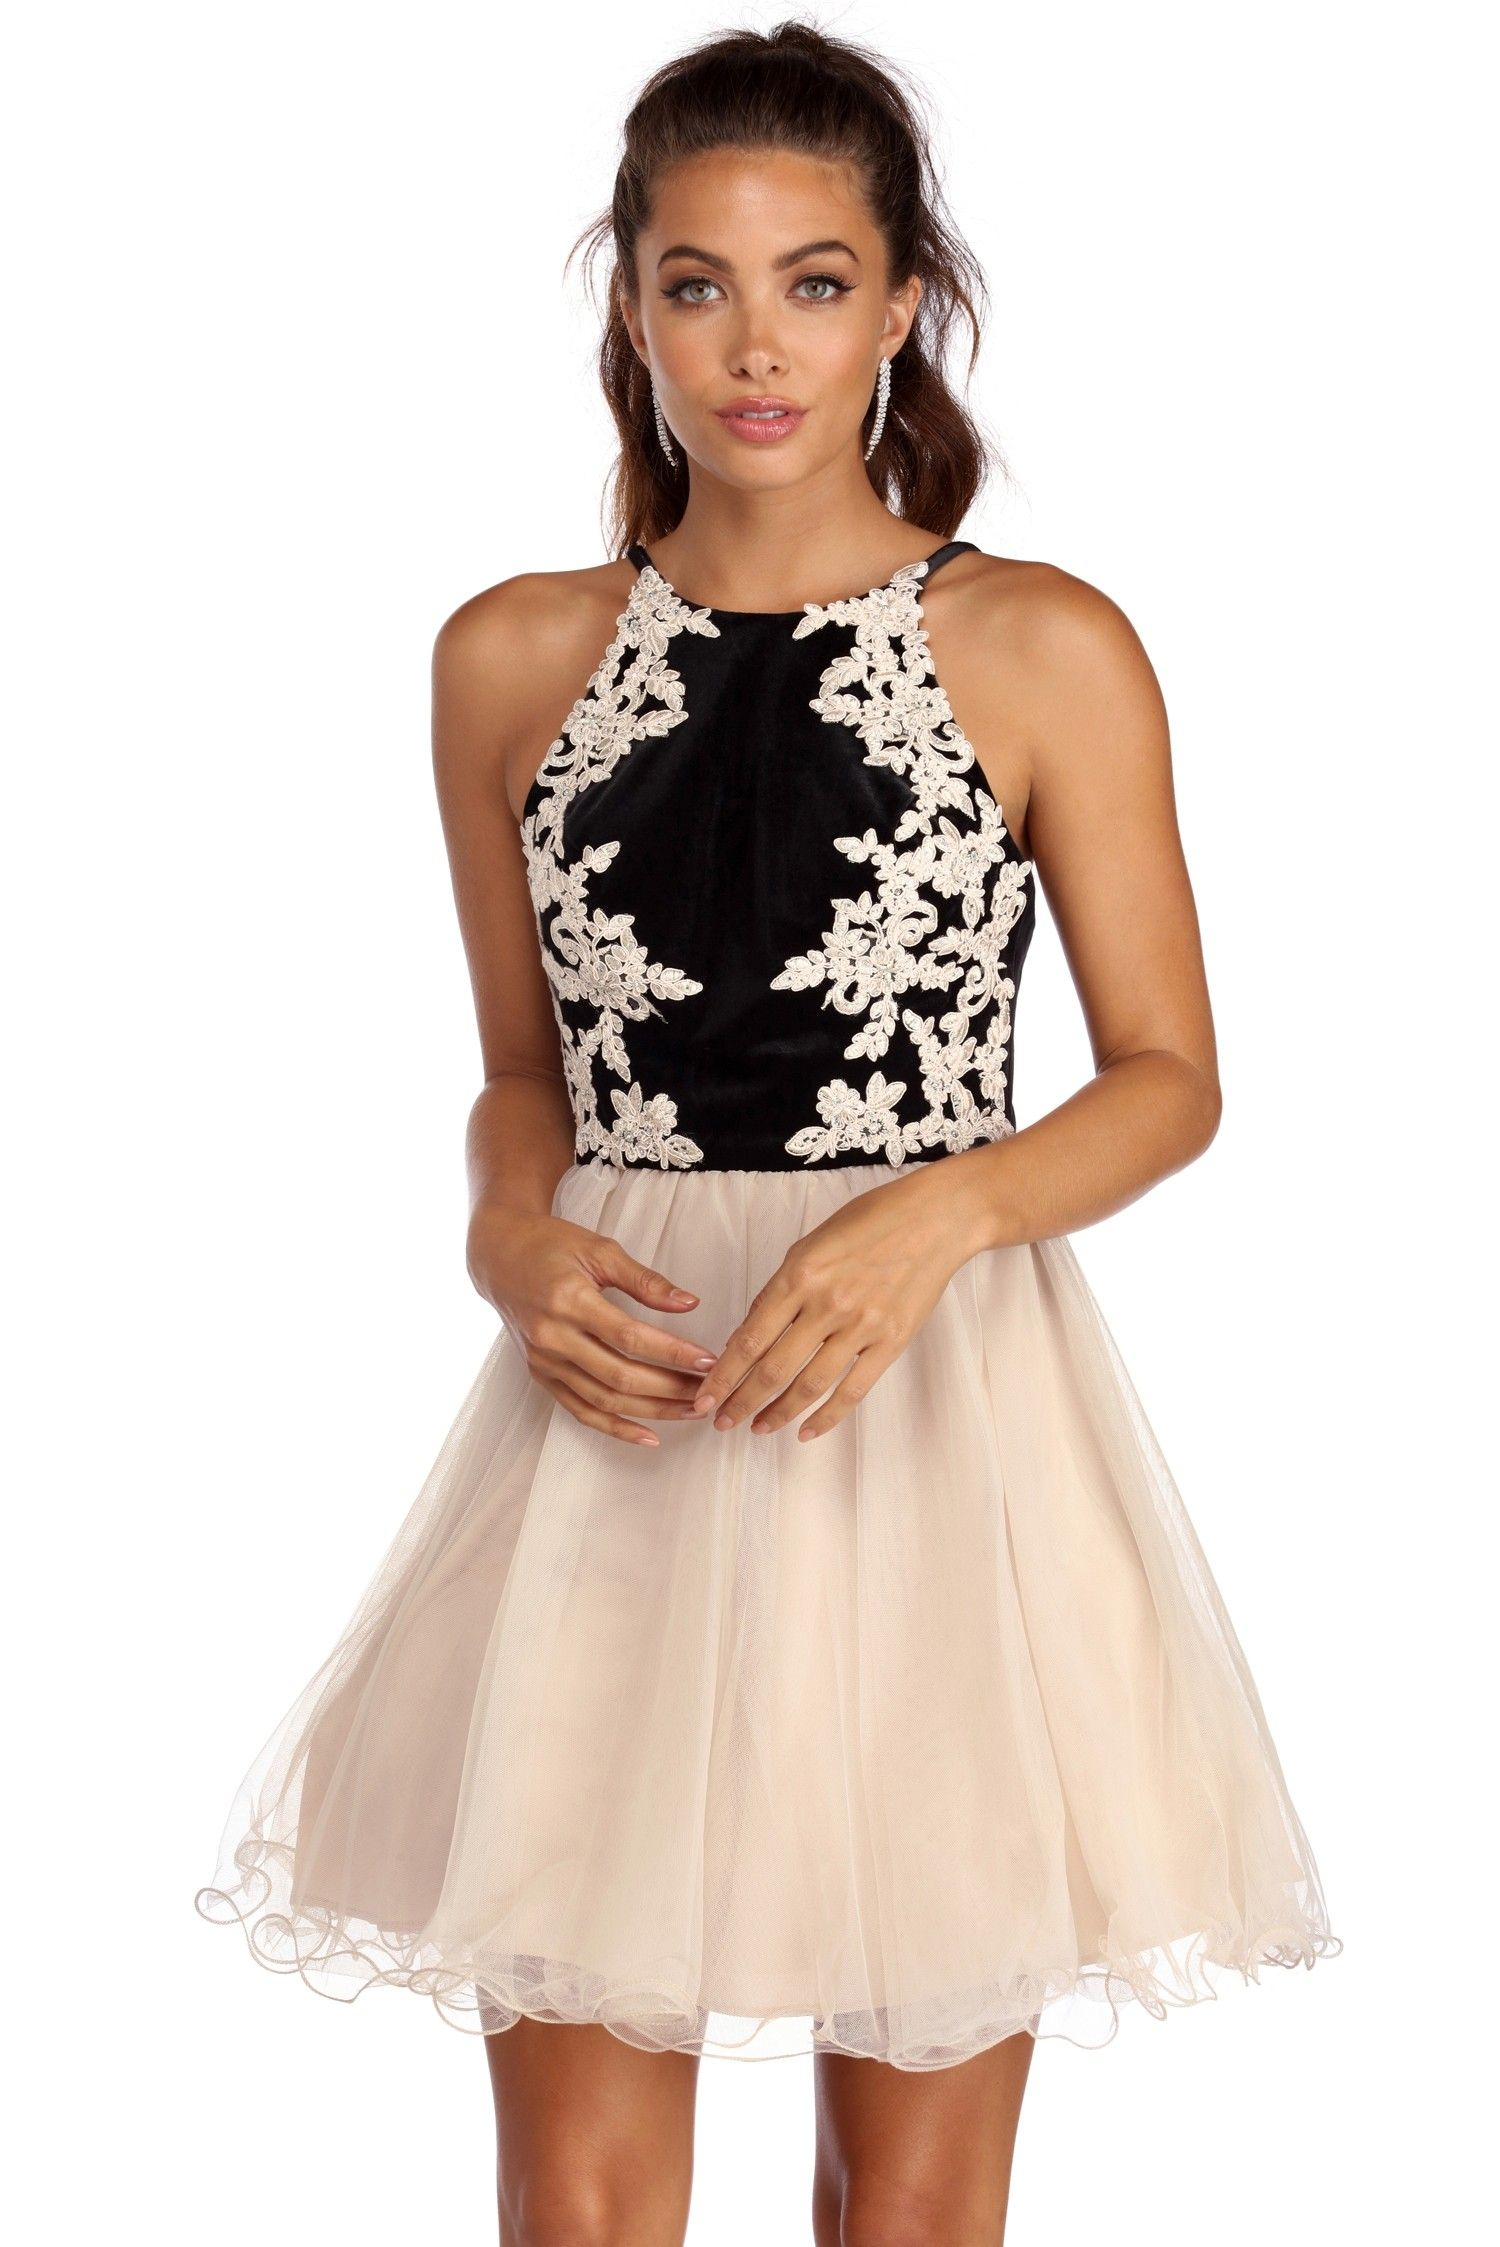 055de89a7f1 FINAL SALE- Jamie Velvet Dreams Party Dress in 2018